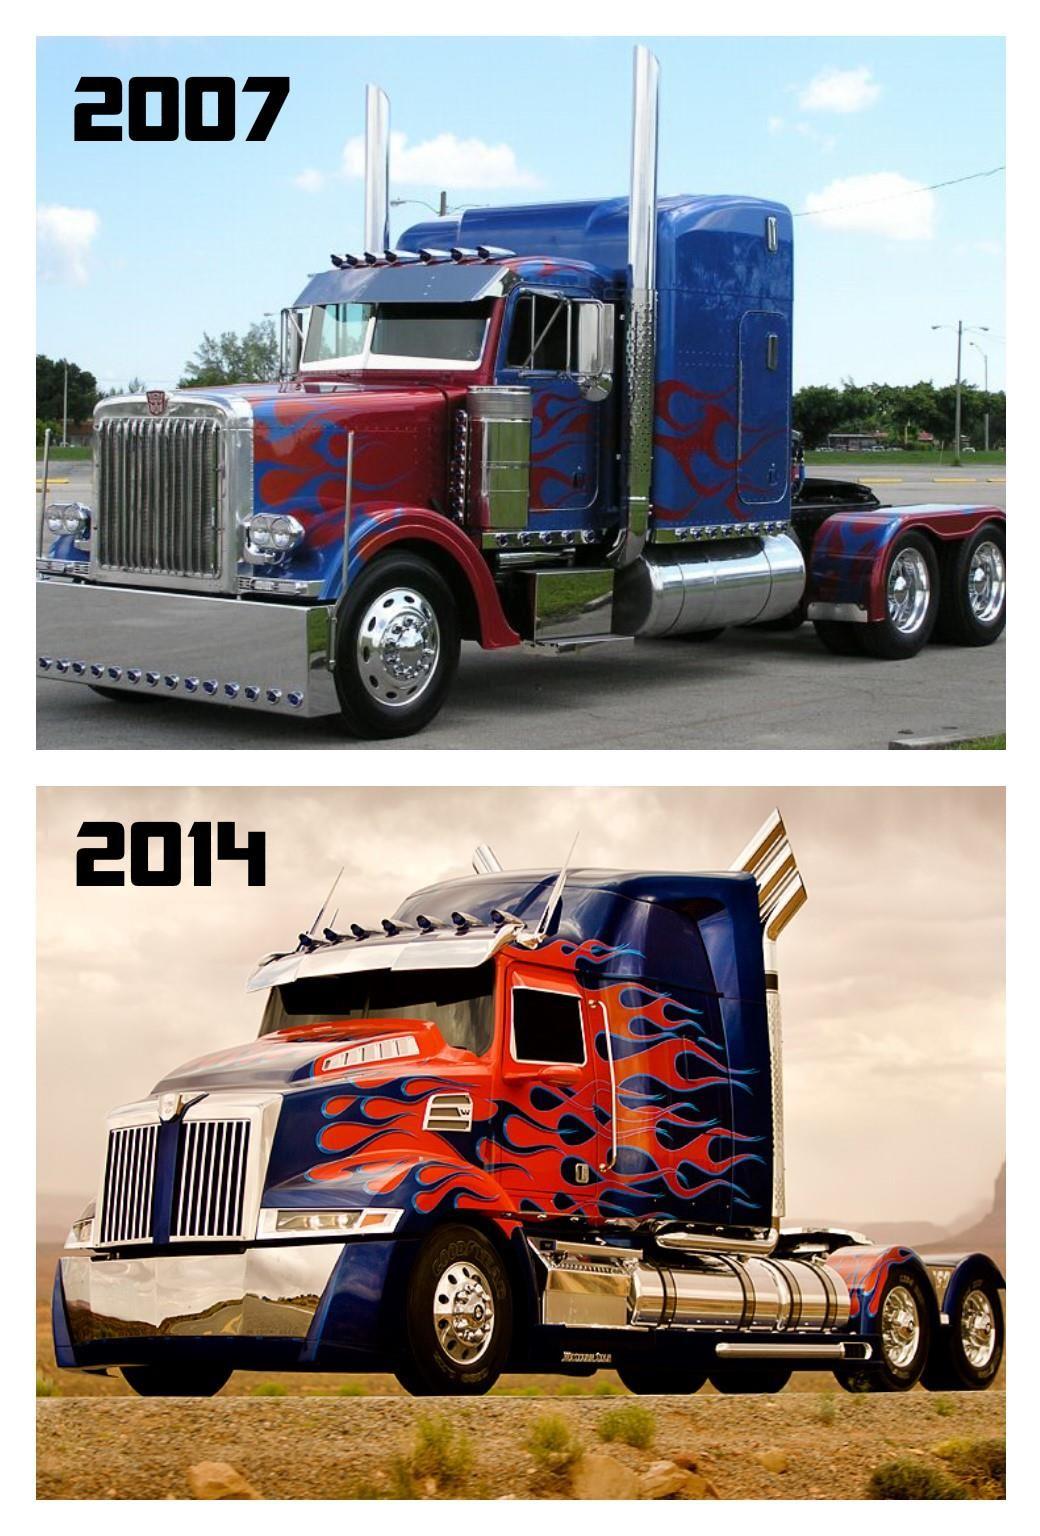 evolution of optimus prime! #movies #transformers   movie stuff